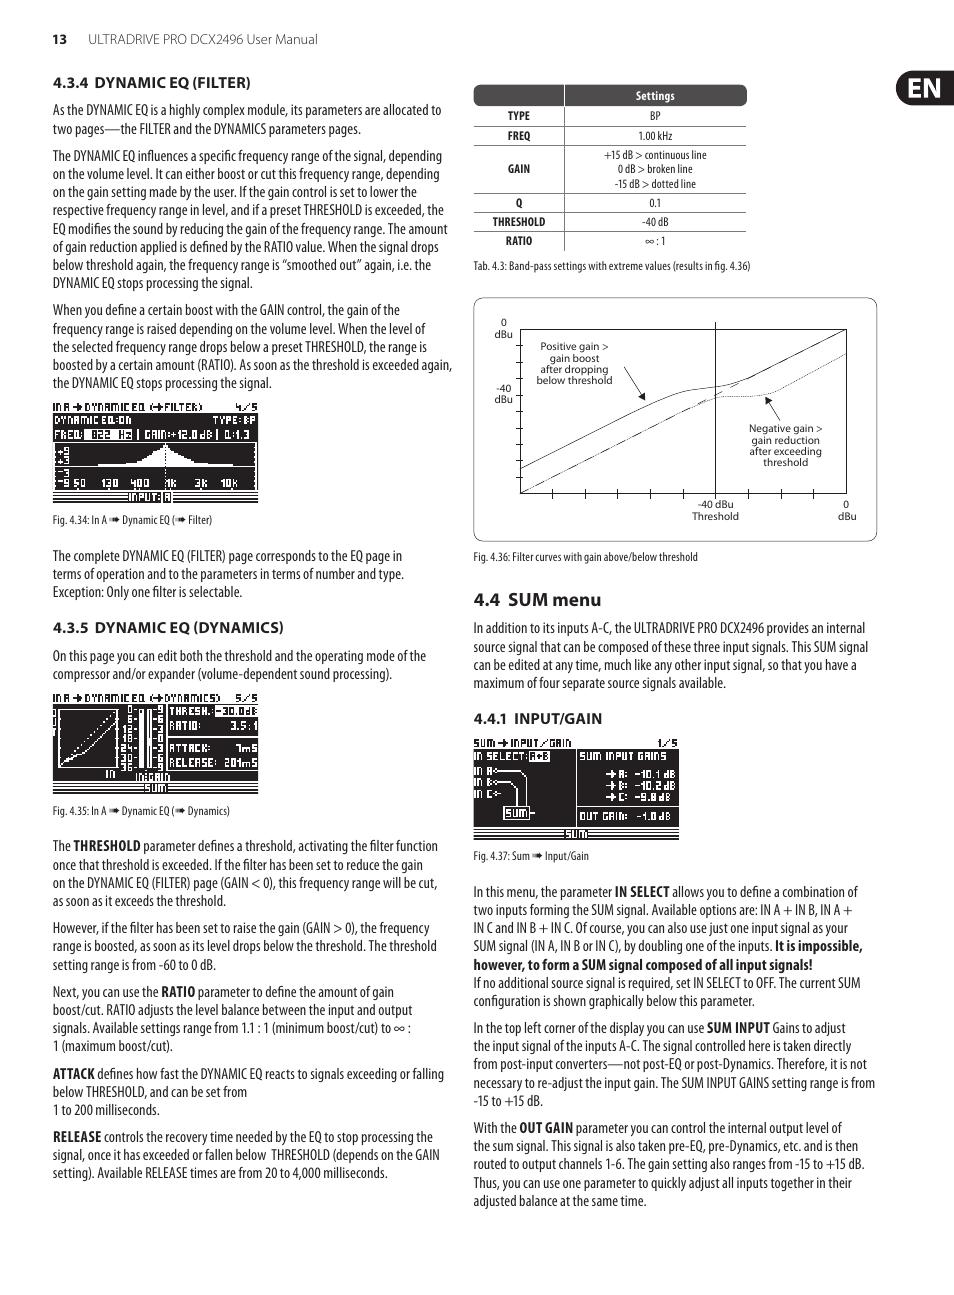 4 sum menu behringer ultradrive pro dcx2496 user manual page 13 rh manualsdir com Behringer X32 Mixer Behringer DriveRack